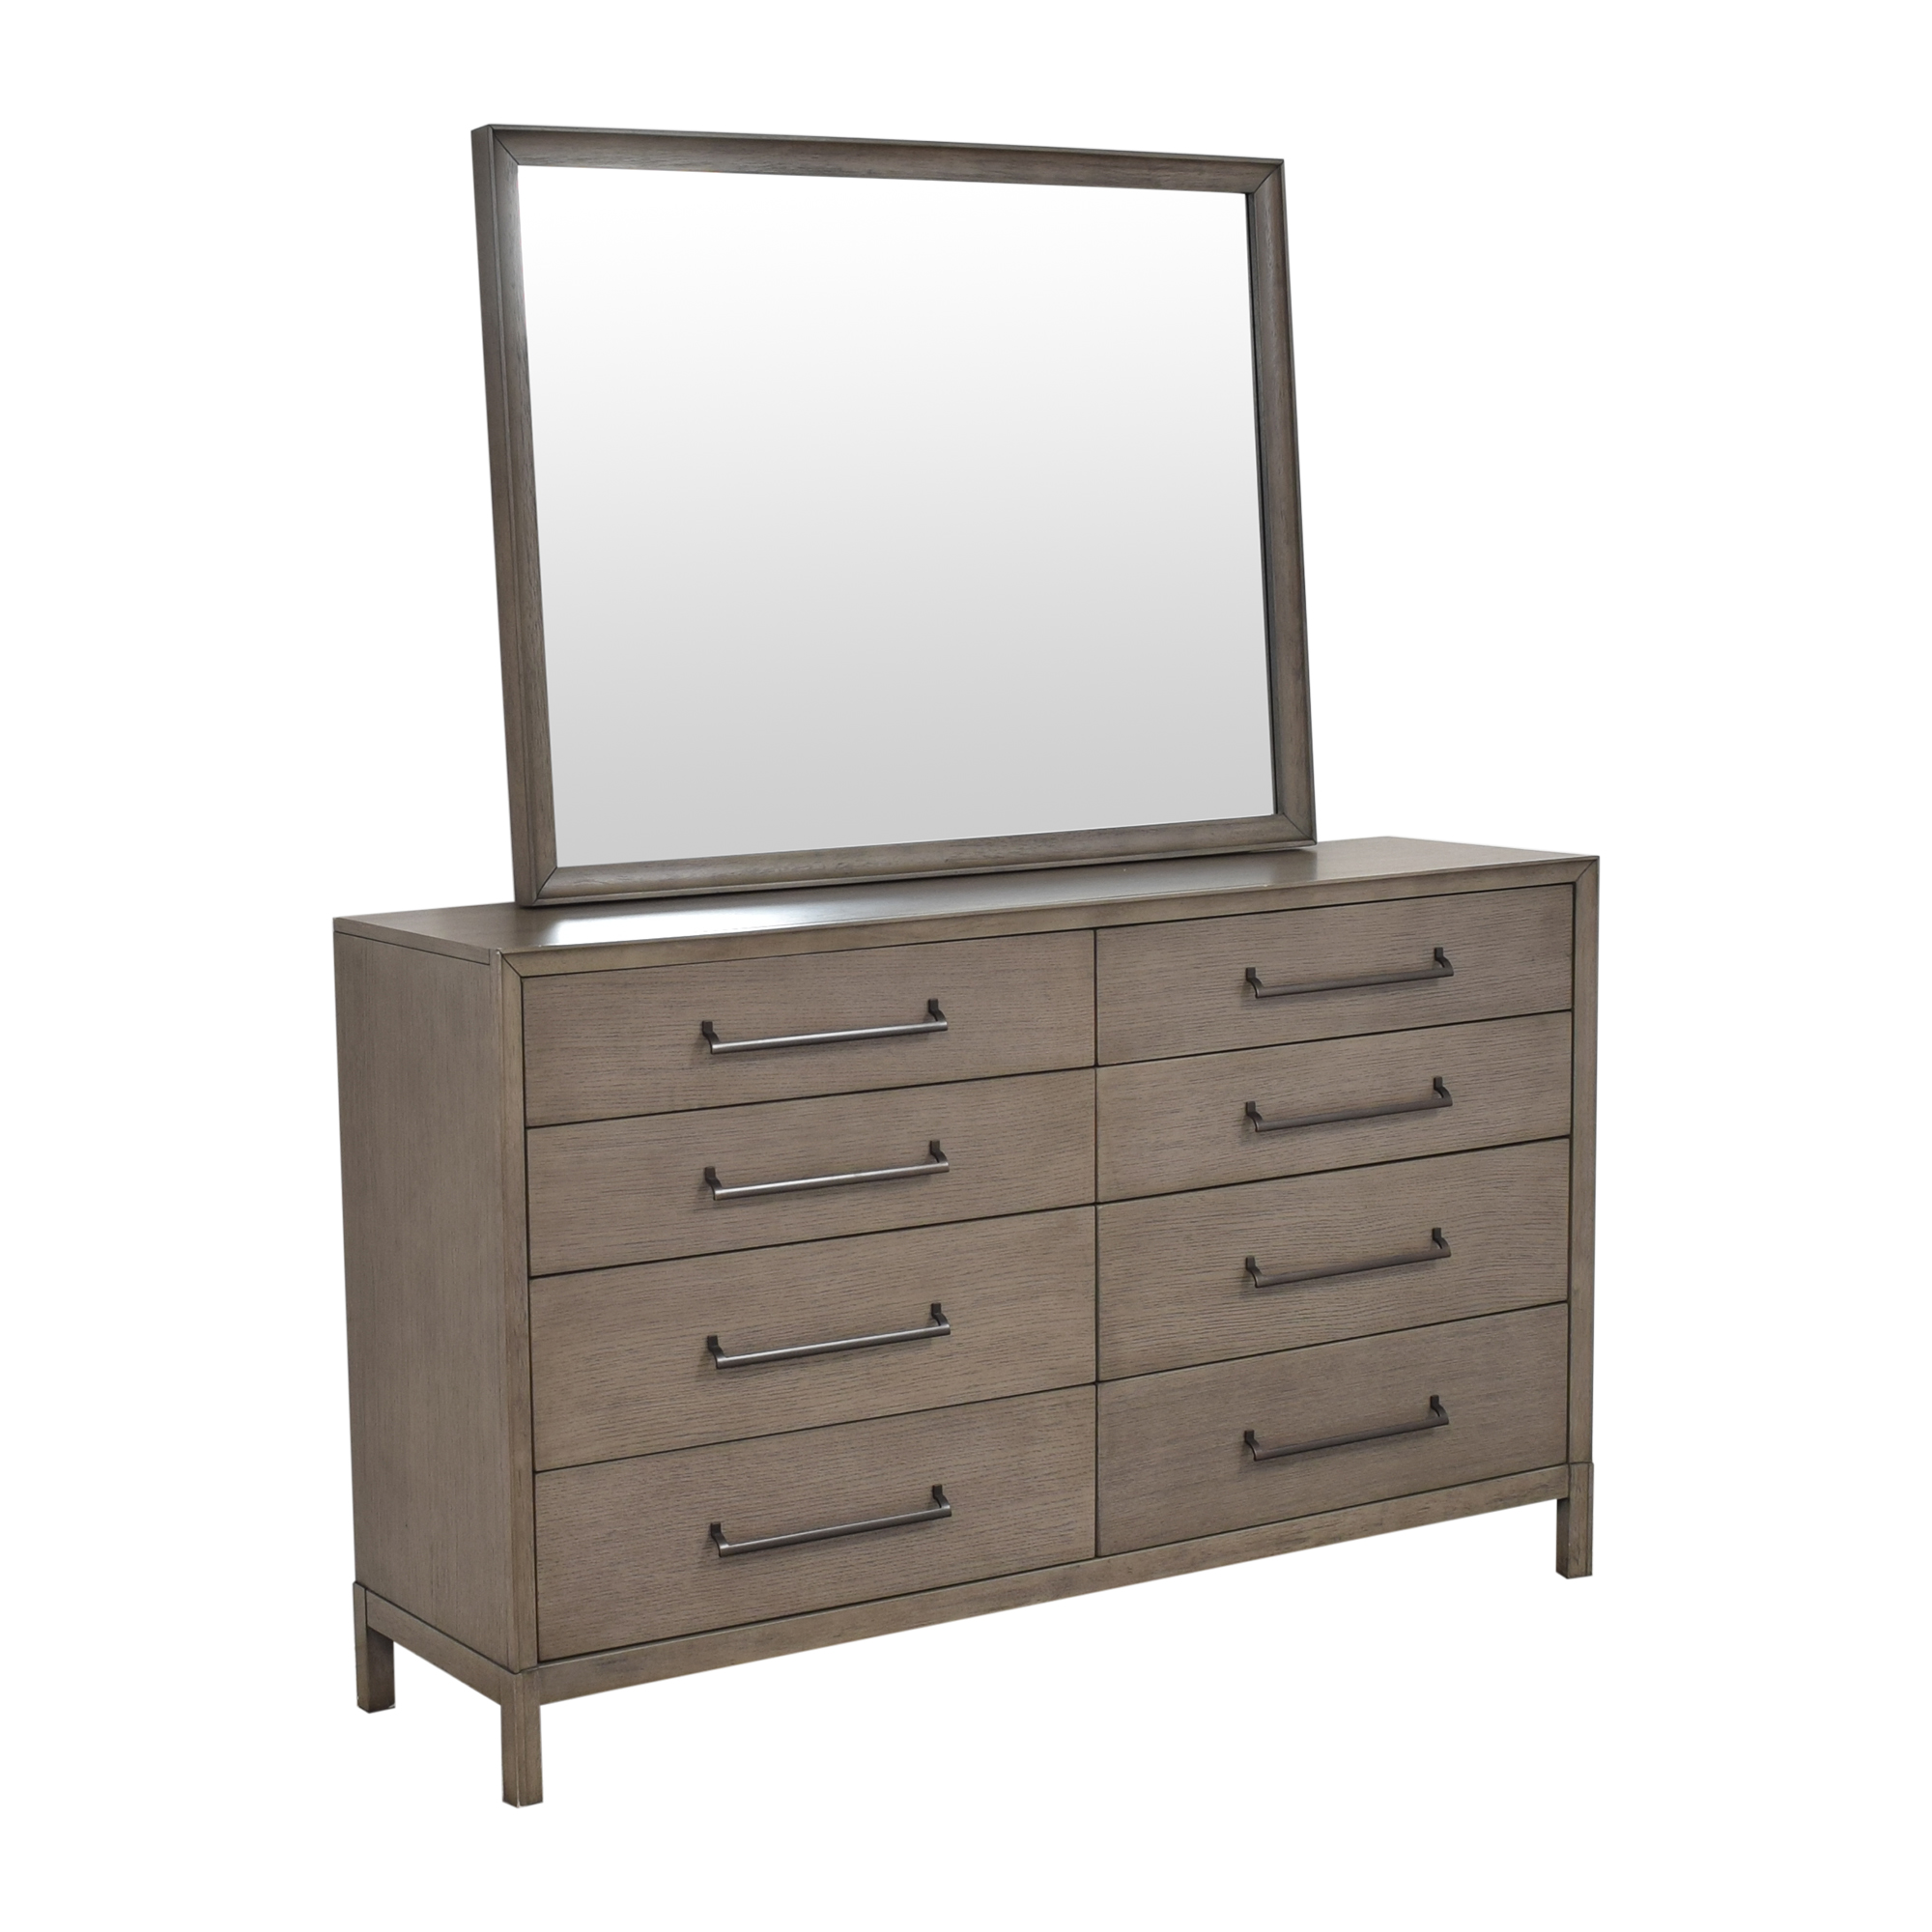 Casana Furniture Casana Double Dresser with Mirror second hand